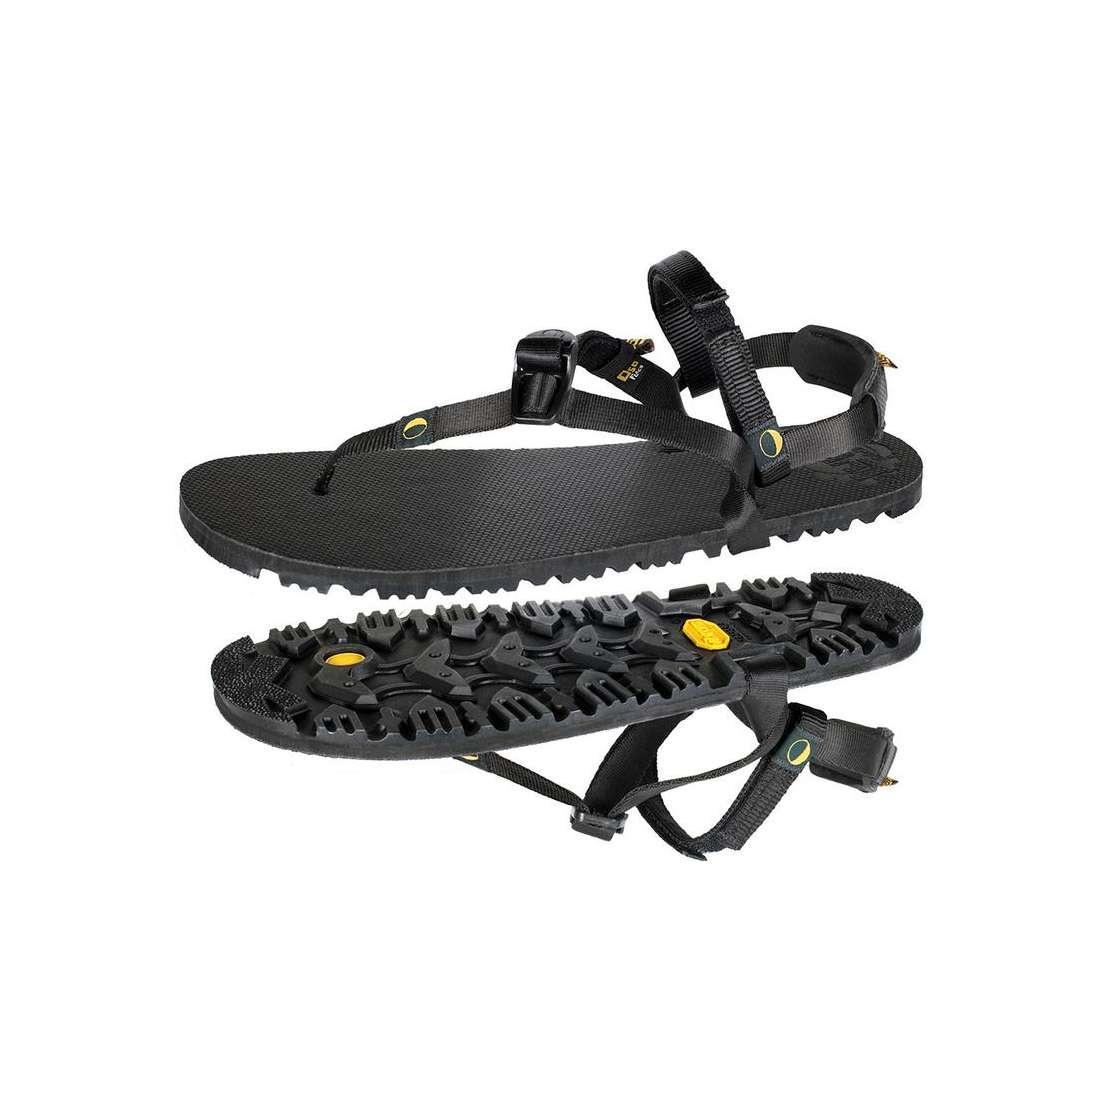 05784f7021a0 Luna Sandals Oso Flaco. Loading zoom